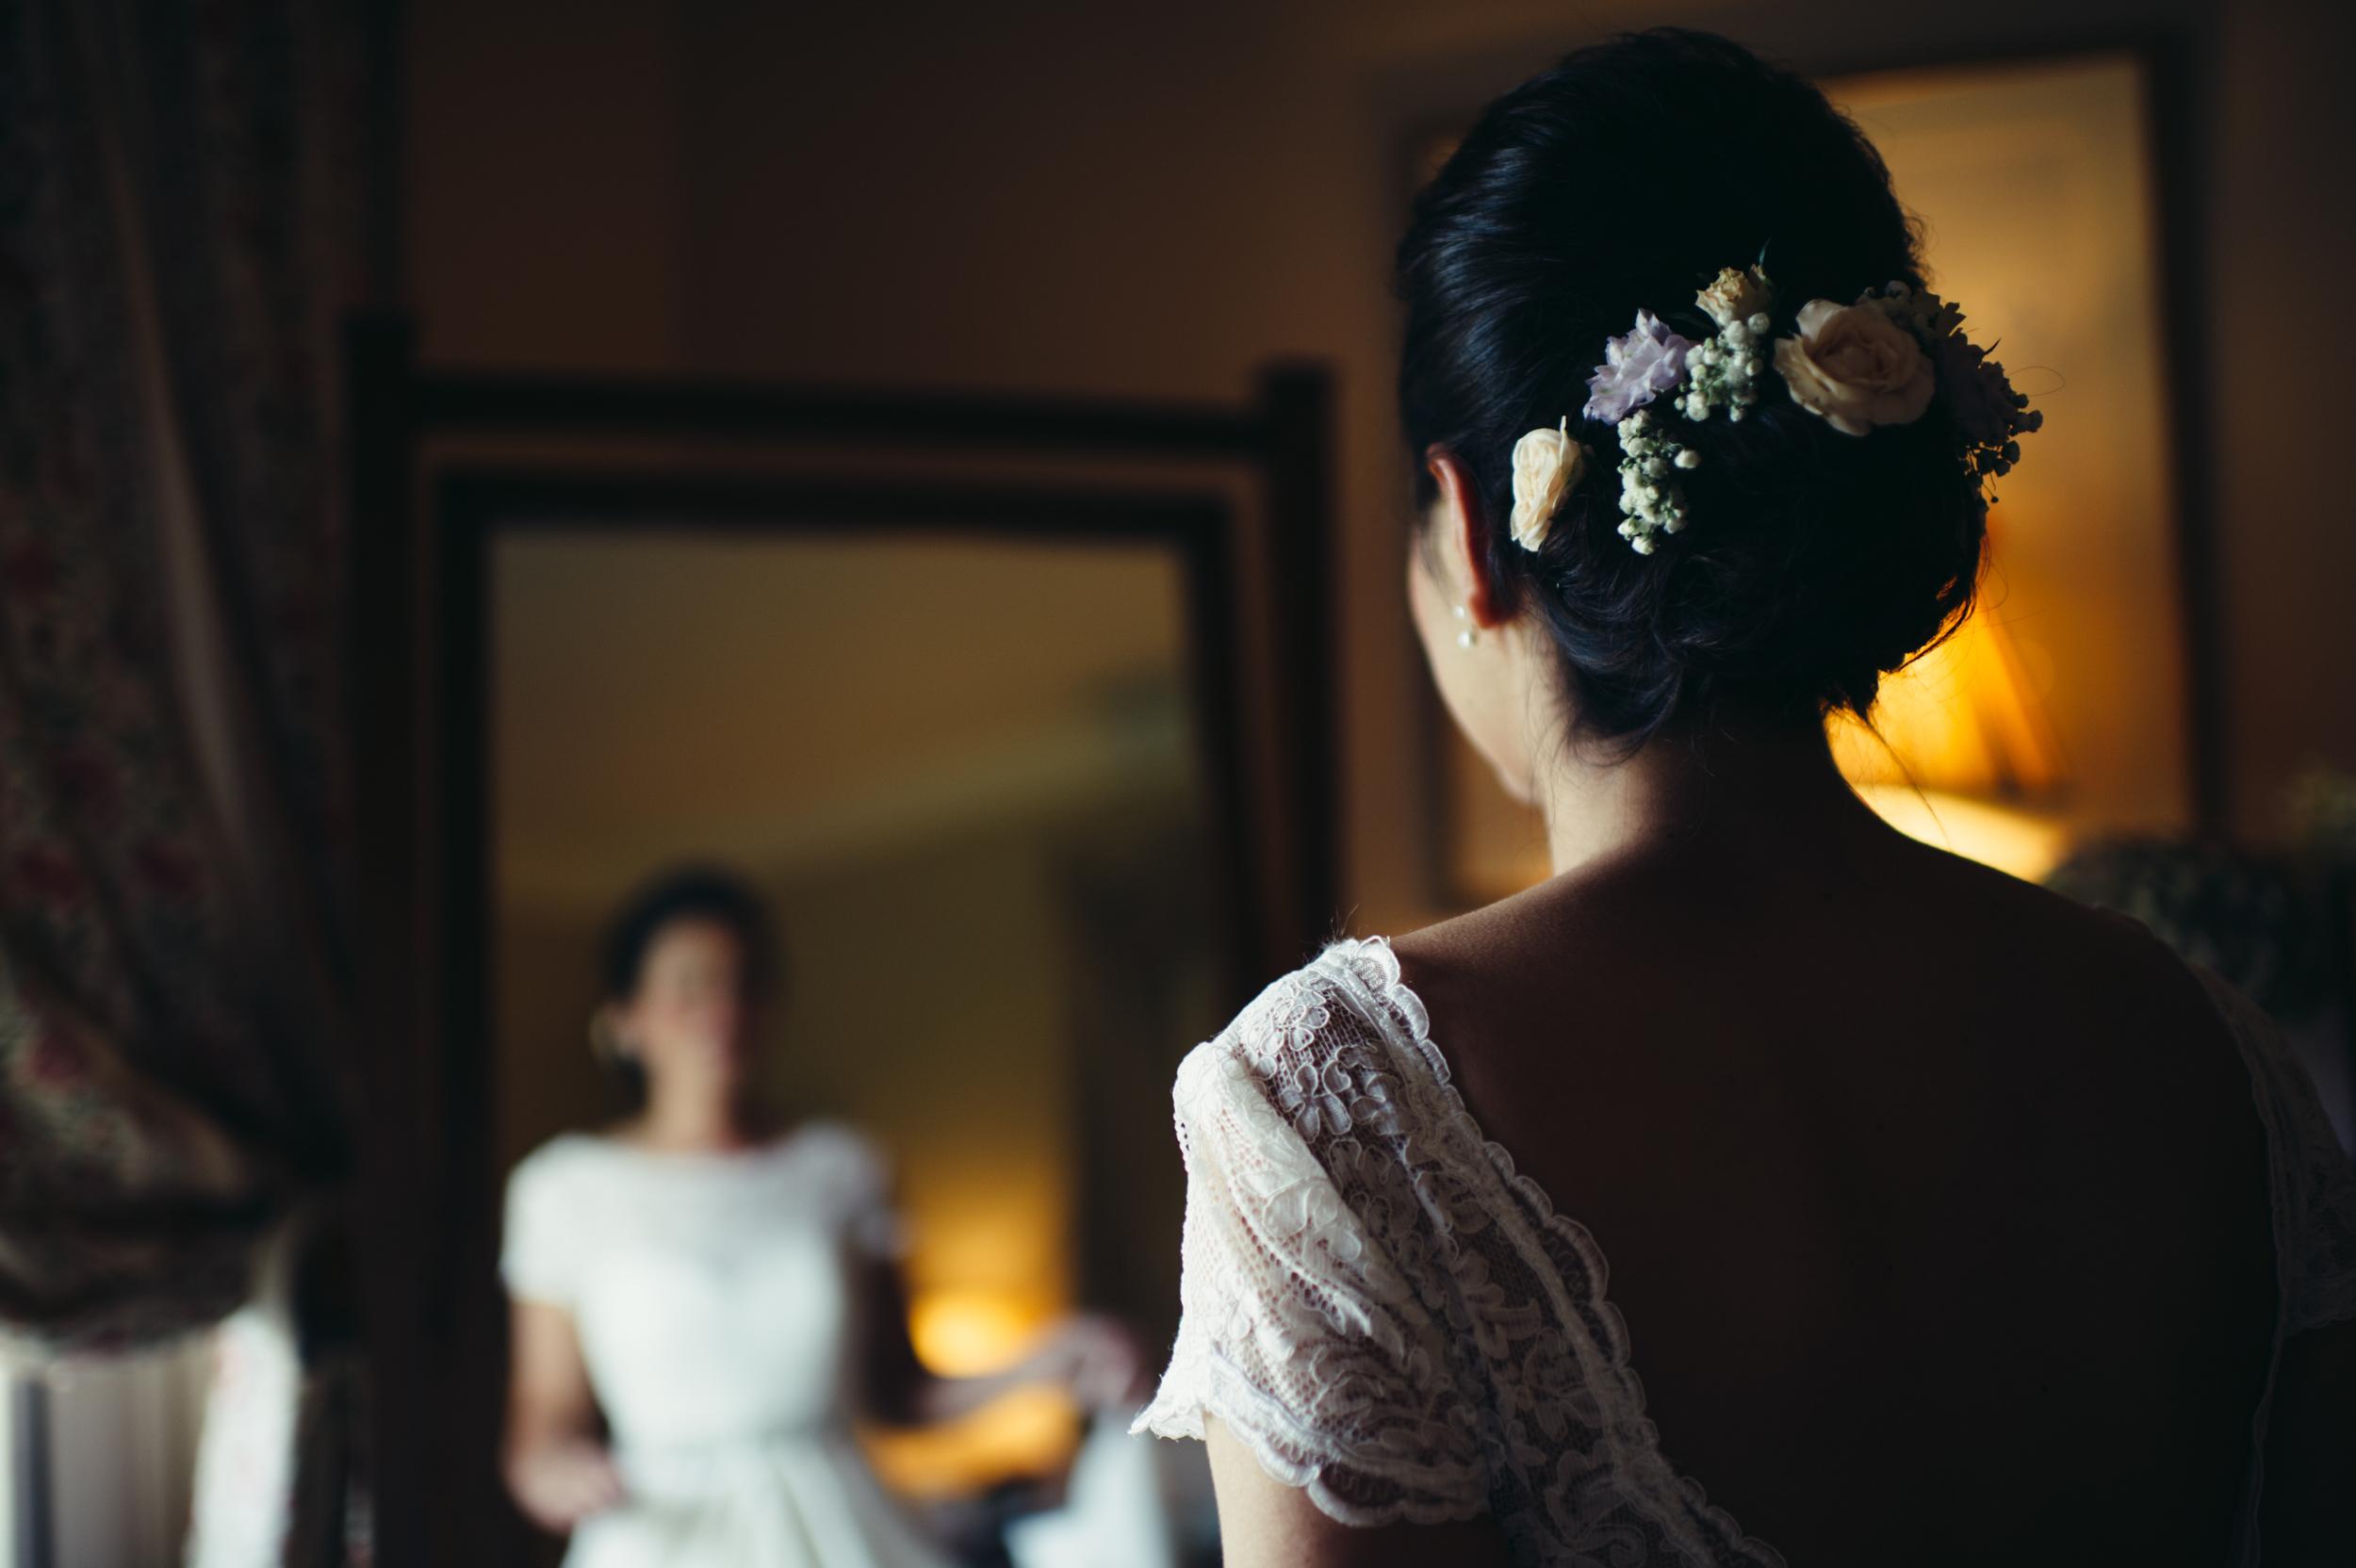 0075-lisa-devine-alternative-creative-wedding-photography-glasgow-edinburgh.JPG